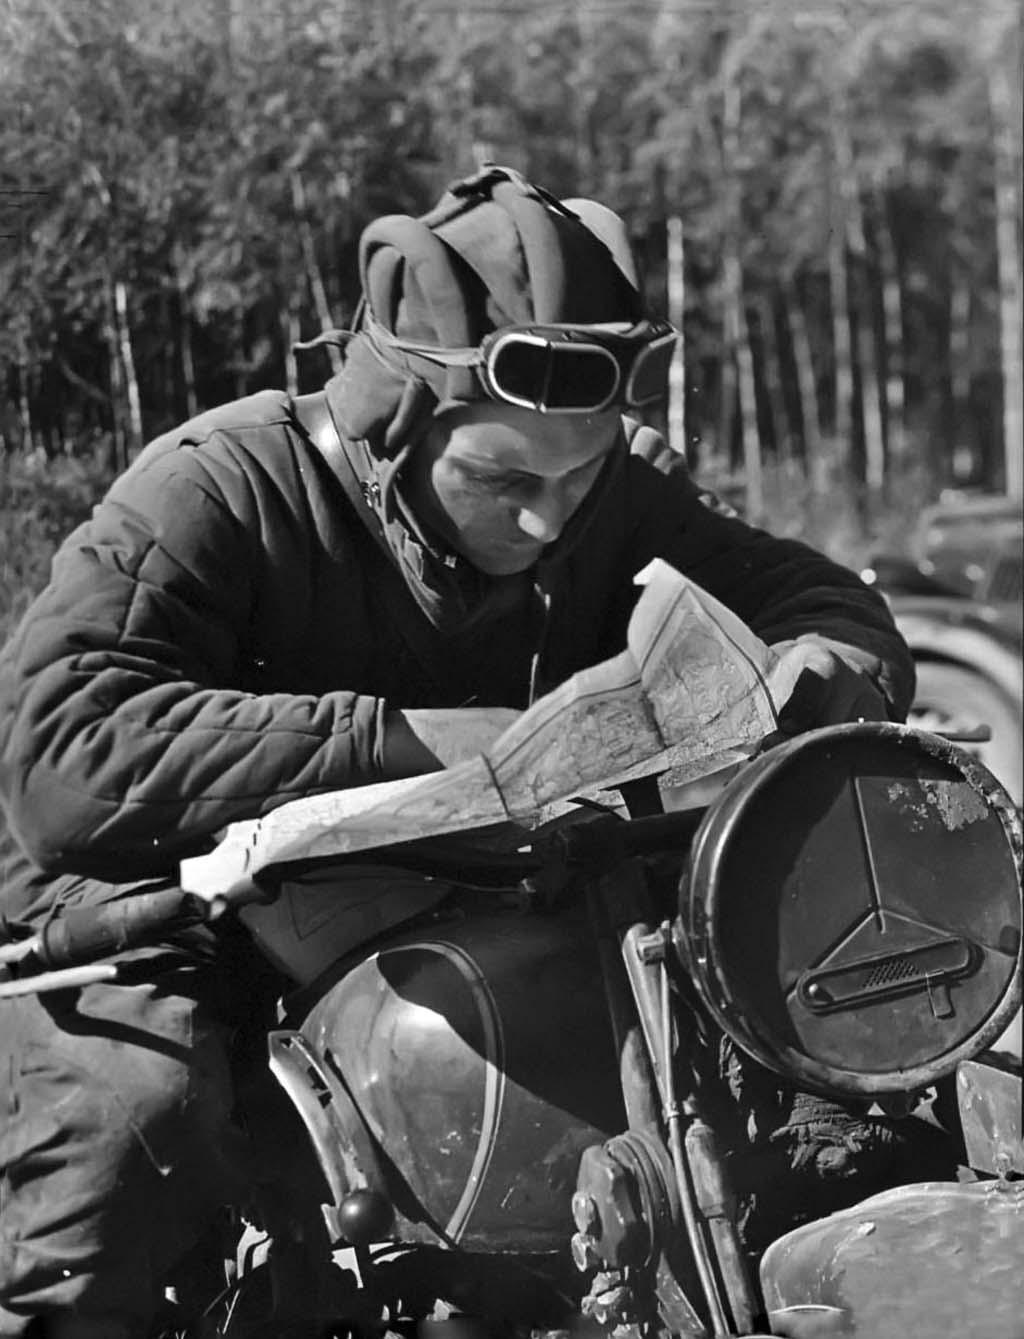 Soviet motorcyclist